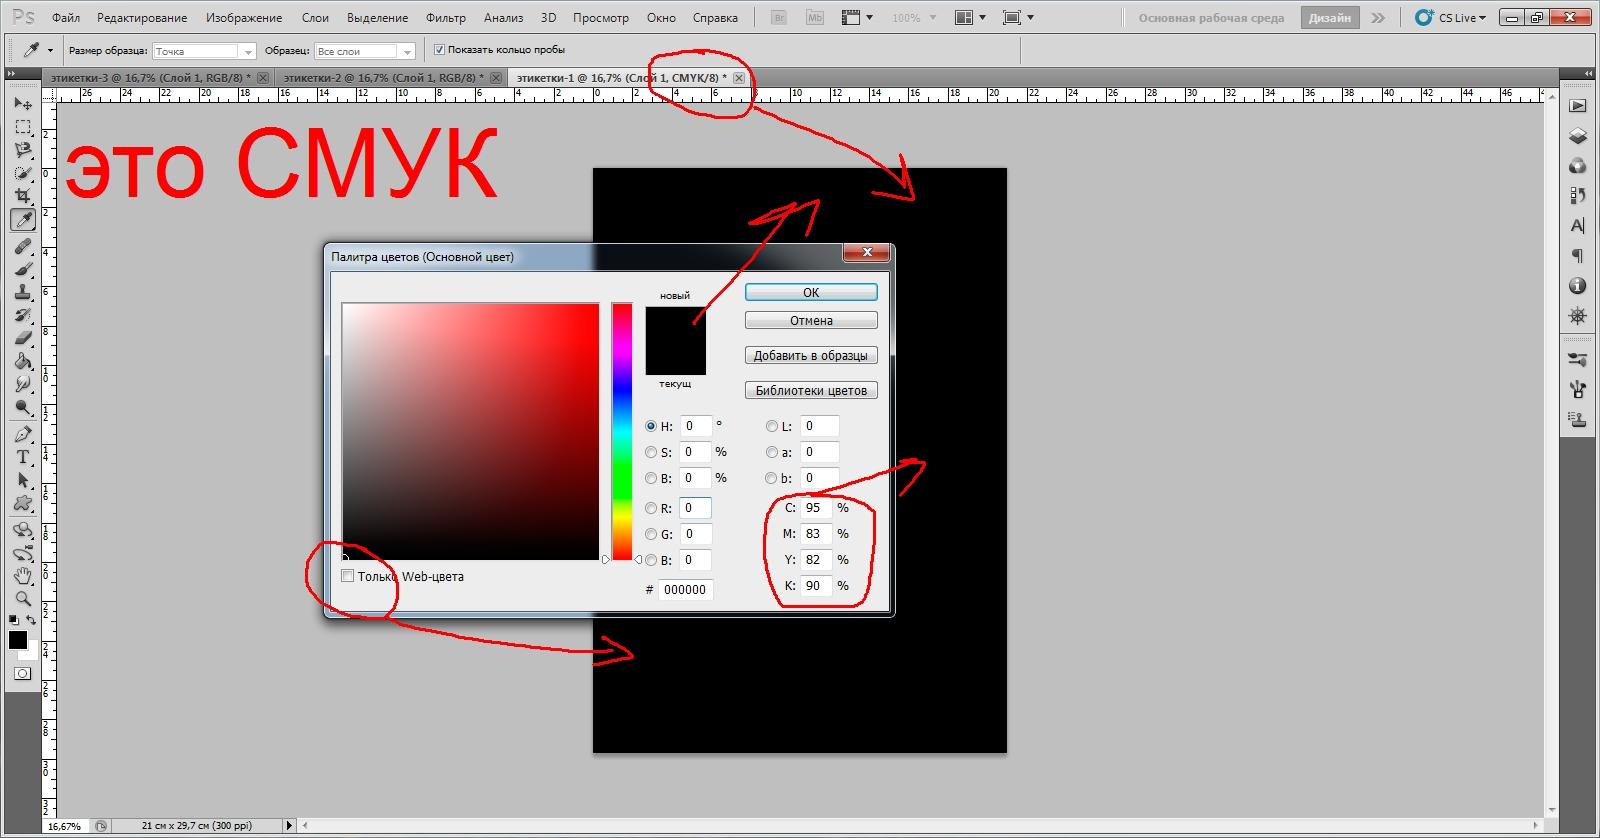 QIP+Shot+-+Screen+1377+06.04.17.jpg